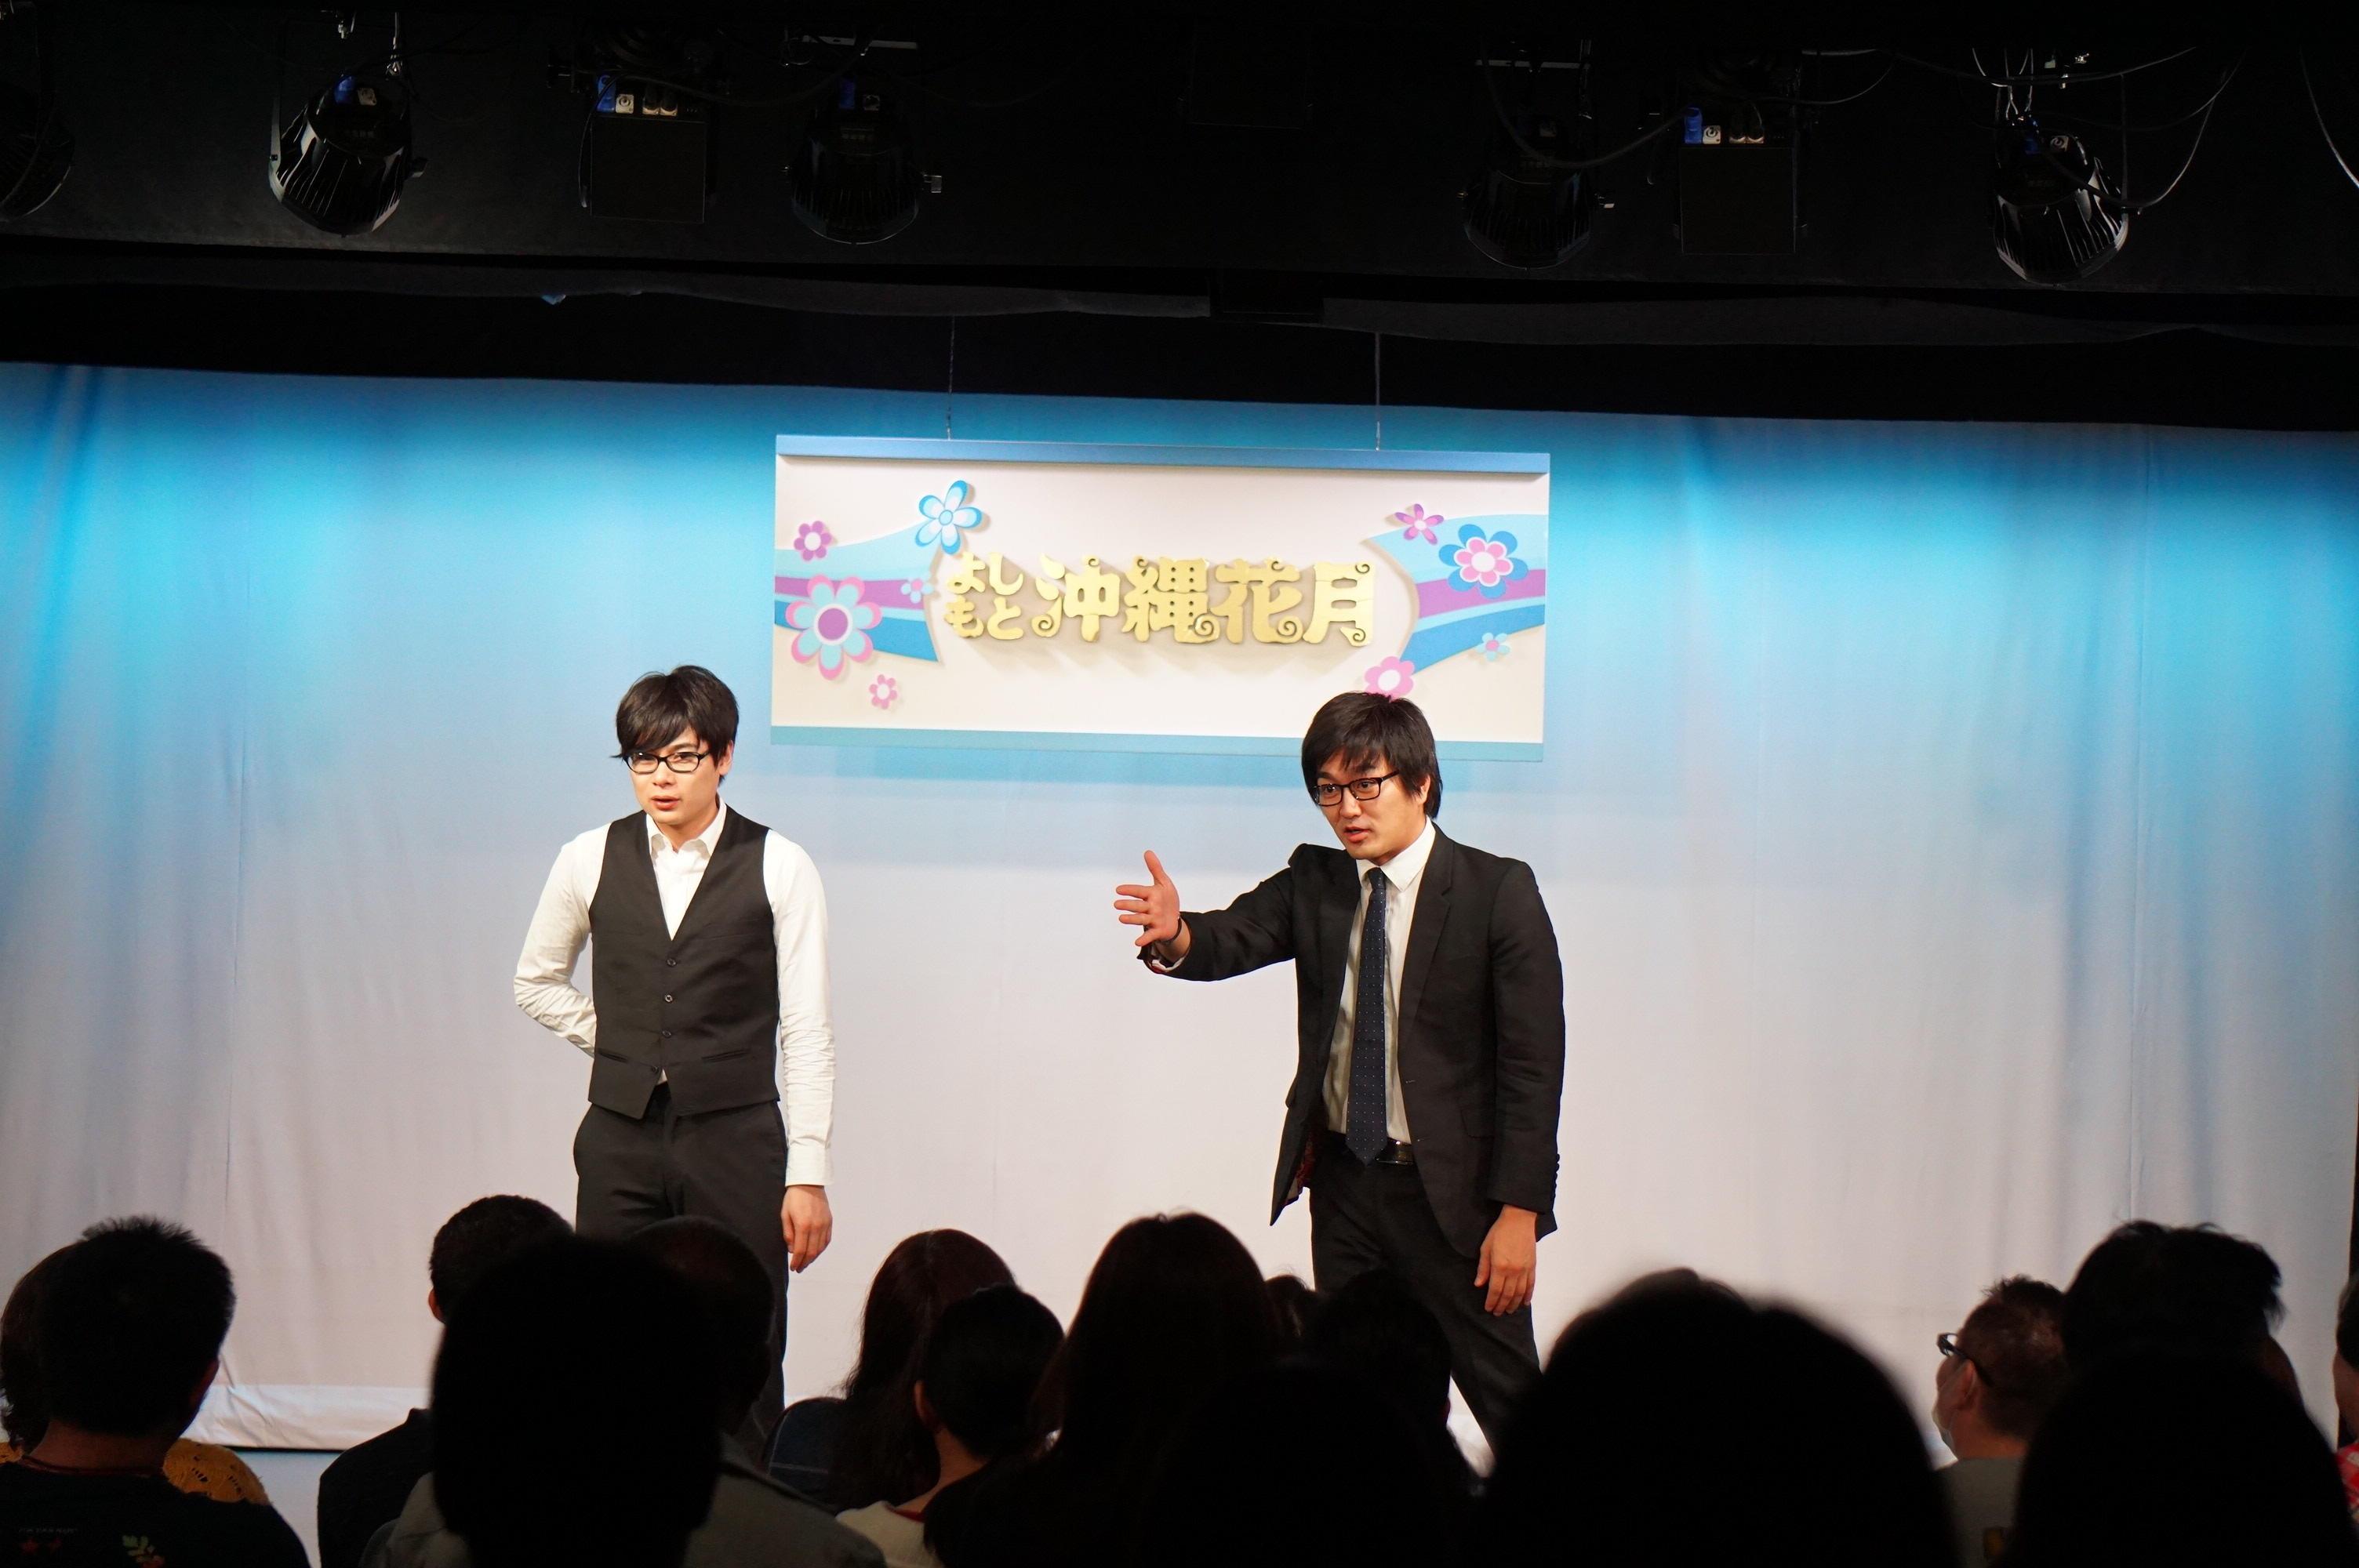 http://news.yoshimoto.co.jp/20151231202114-ac11cd388a63de0bd15a5eebfed80c1b03af39d9.jpg